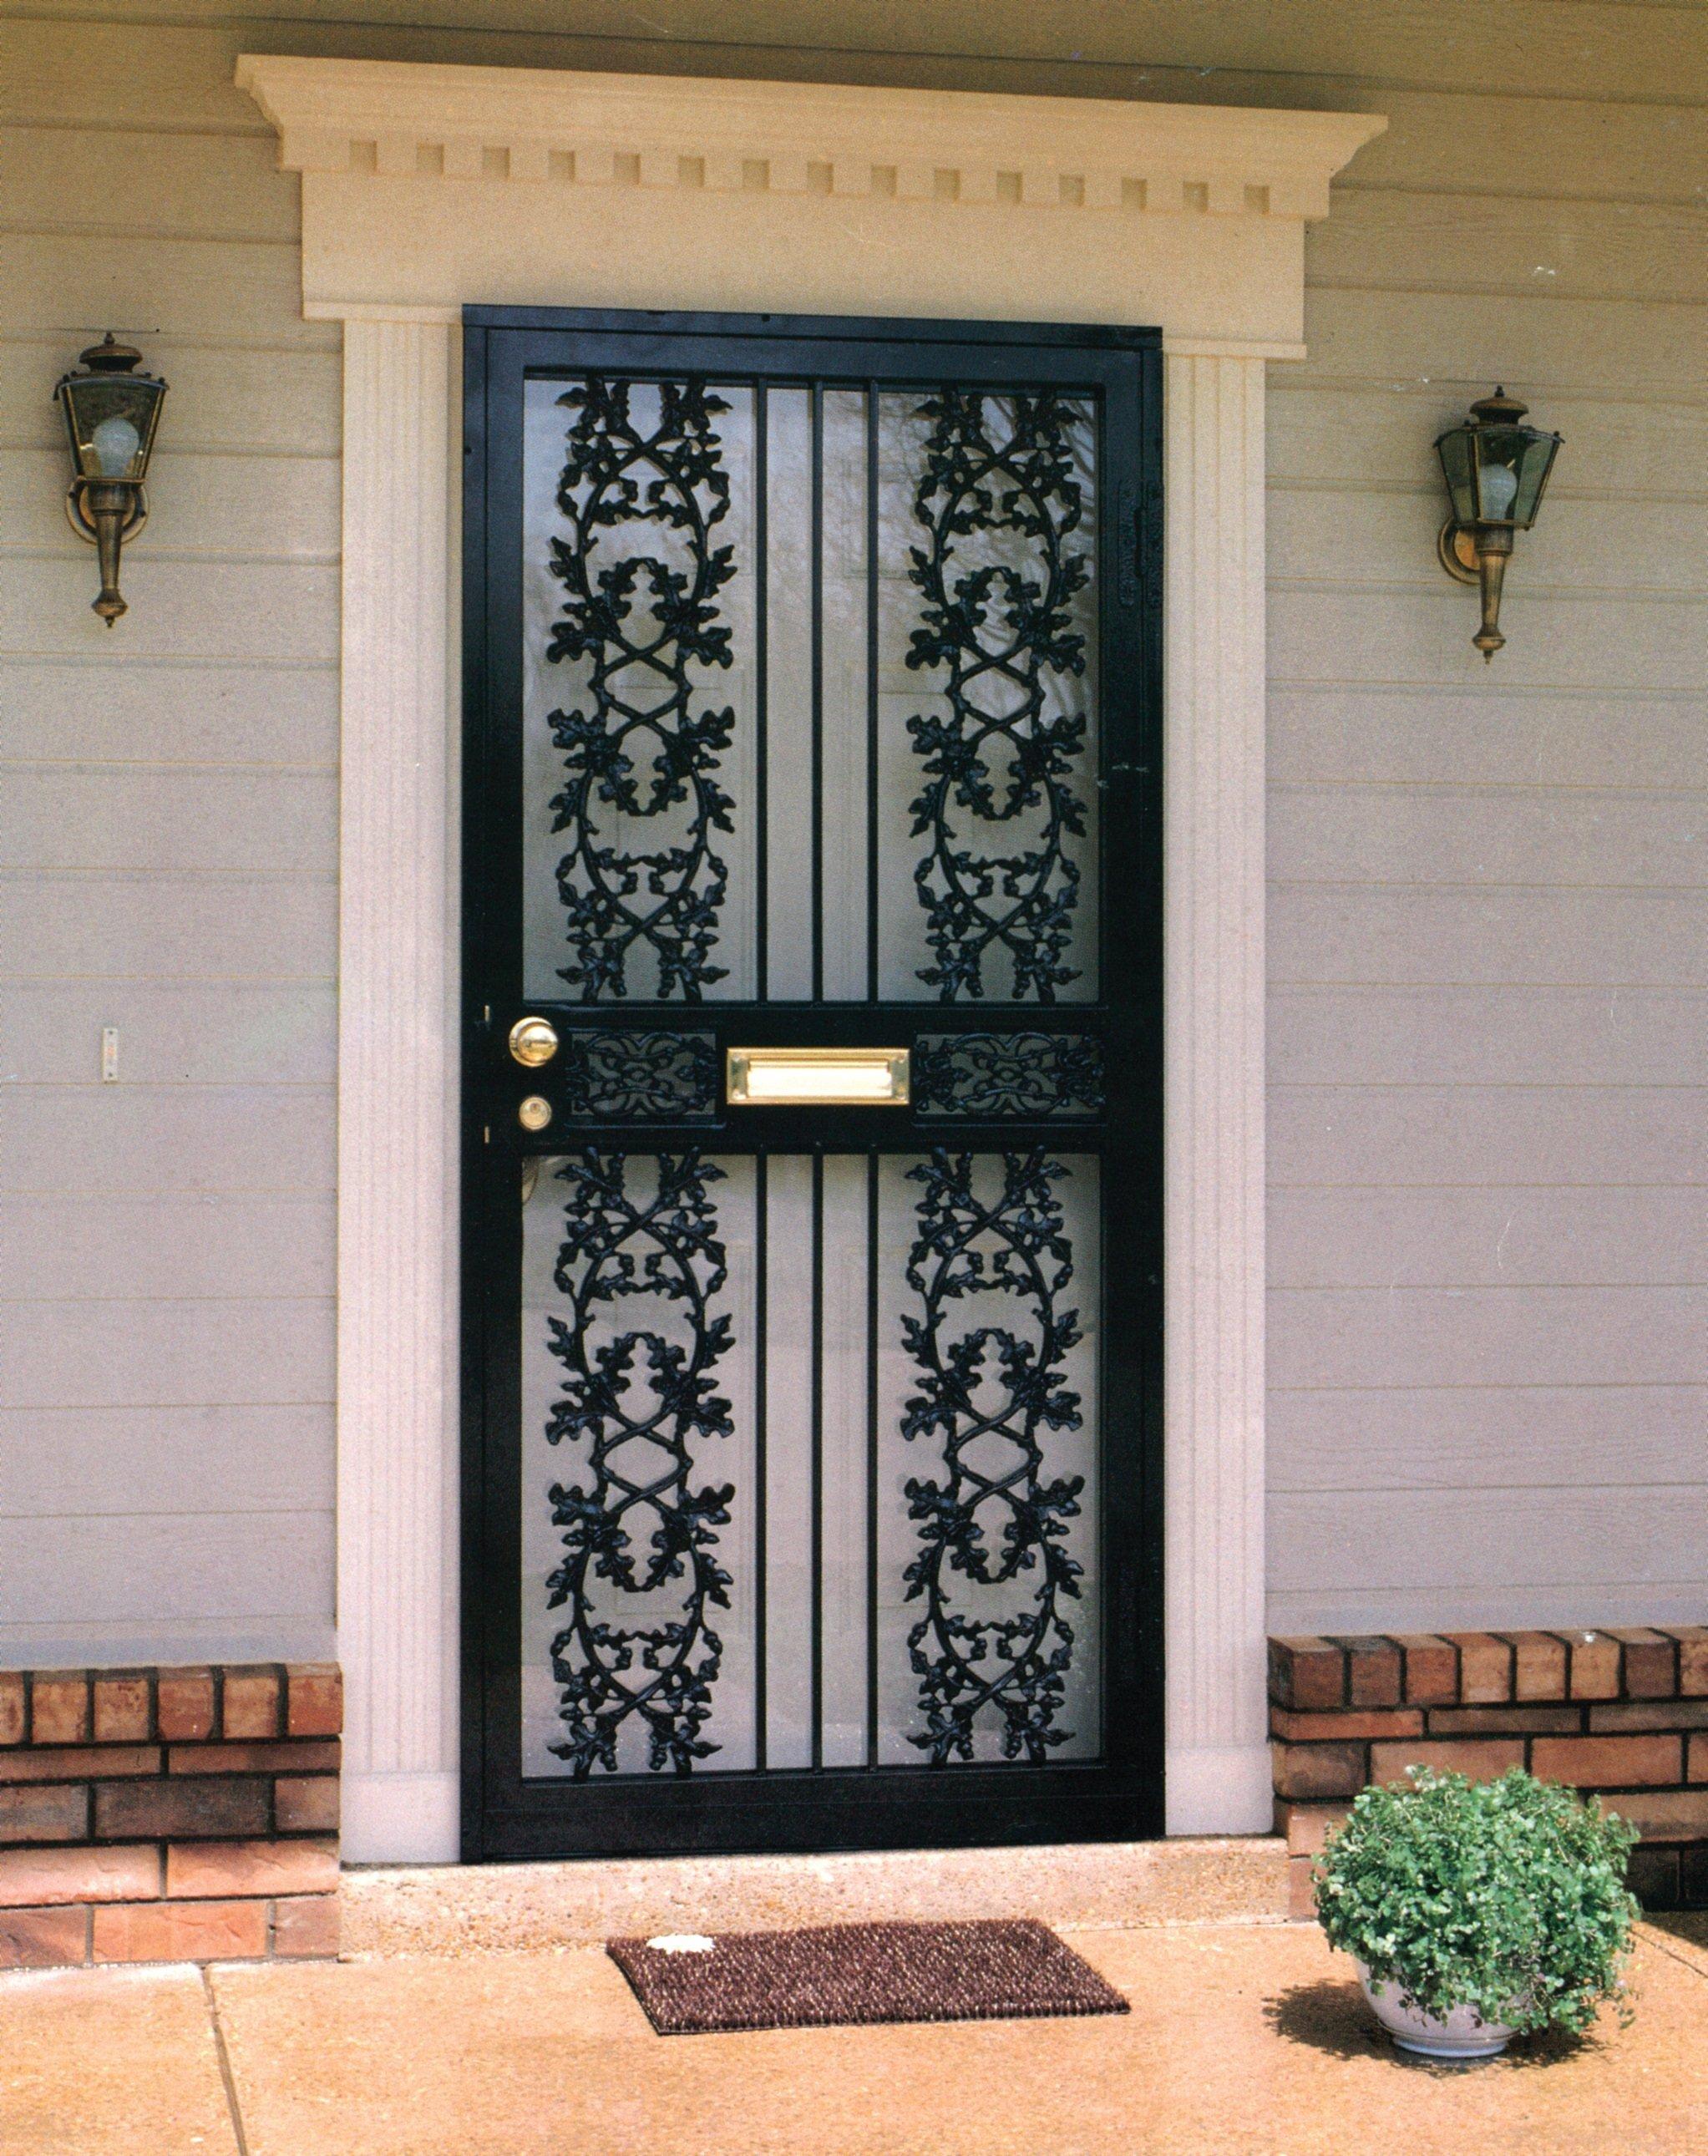 for products crimsafe doors gallery door screens our perth security bifold